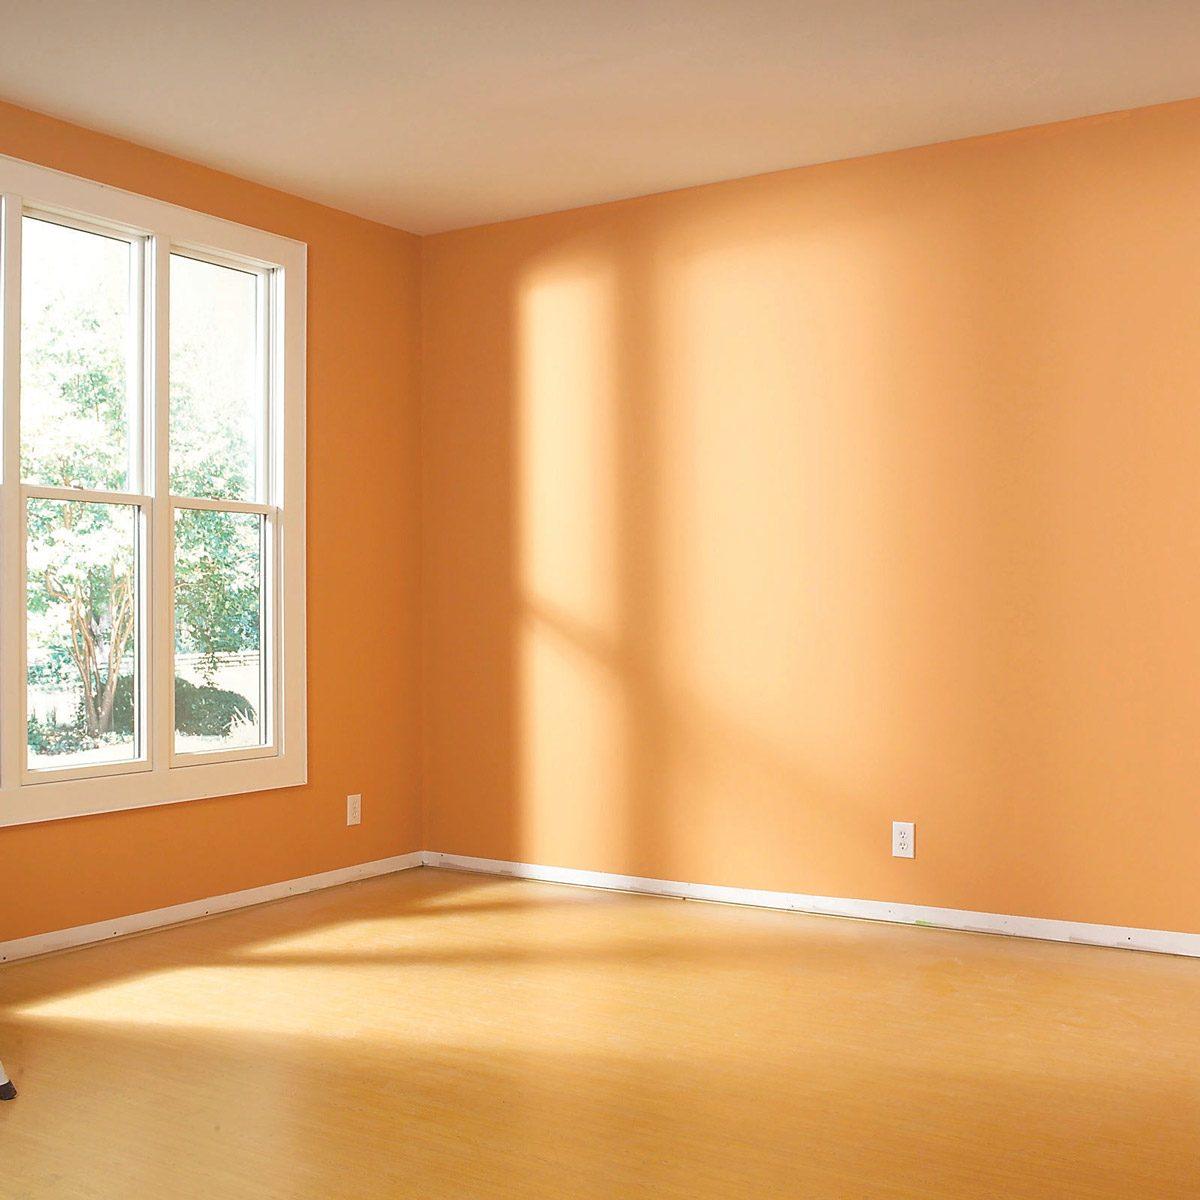 empty open sunny room